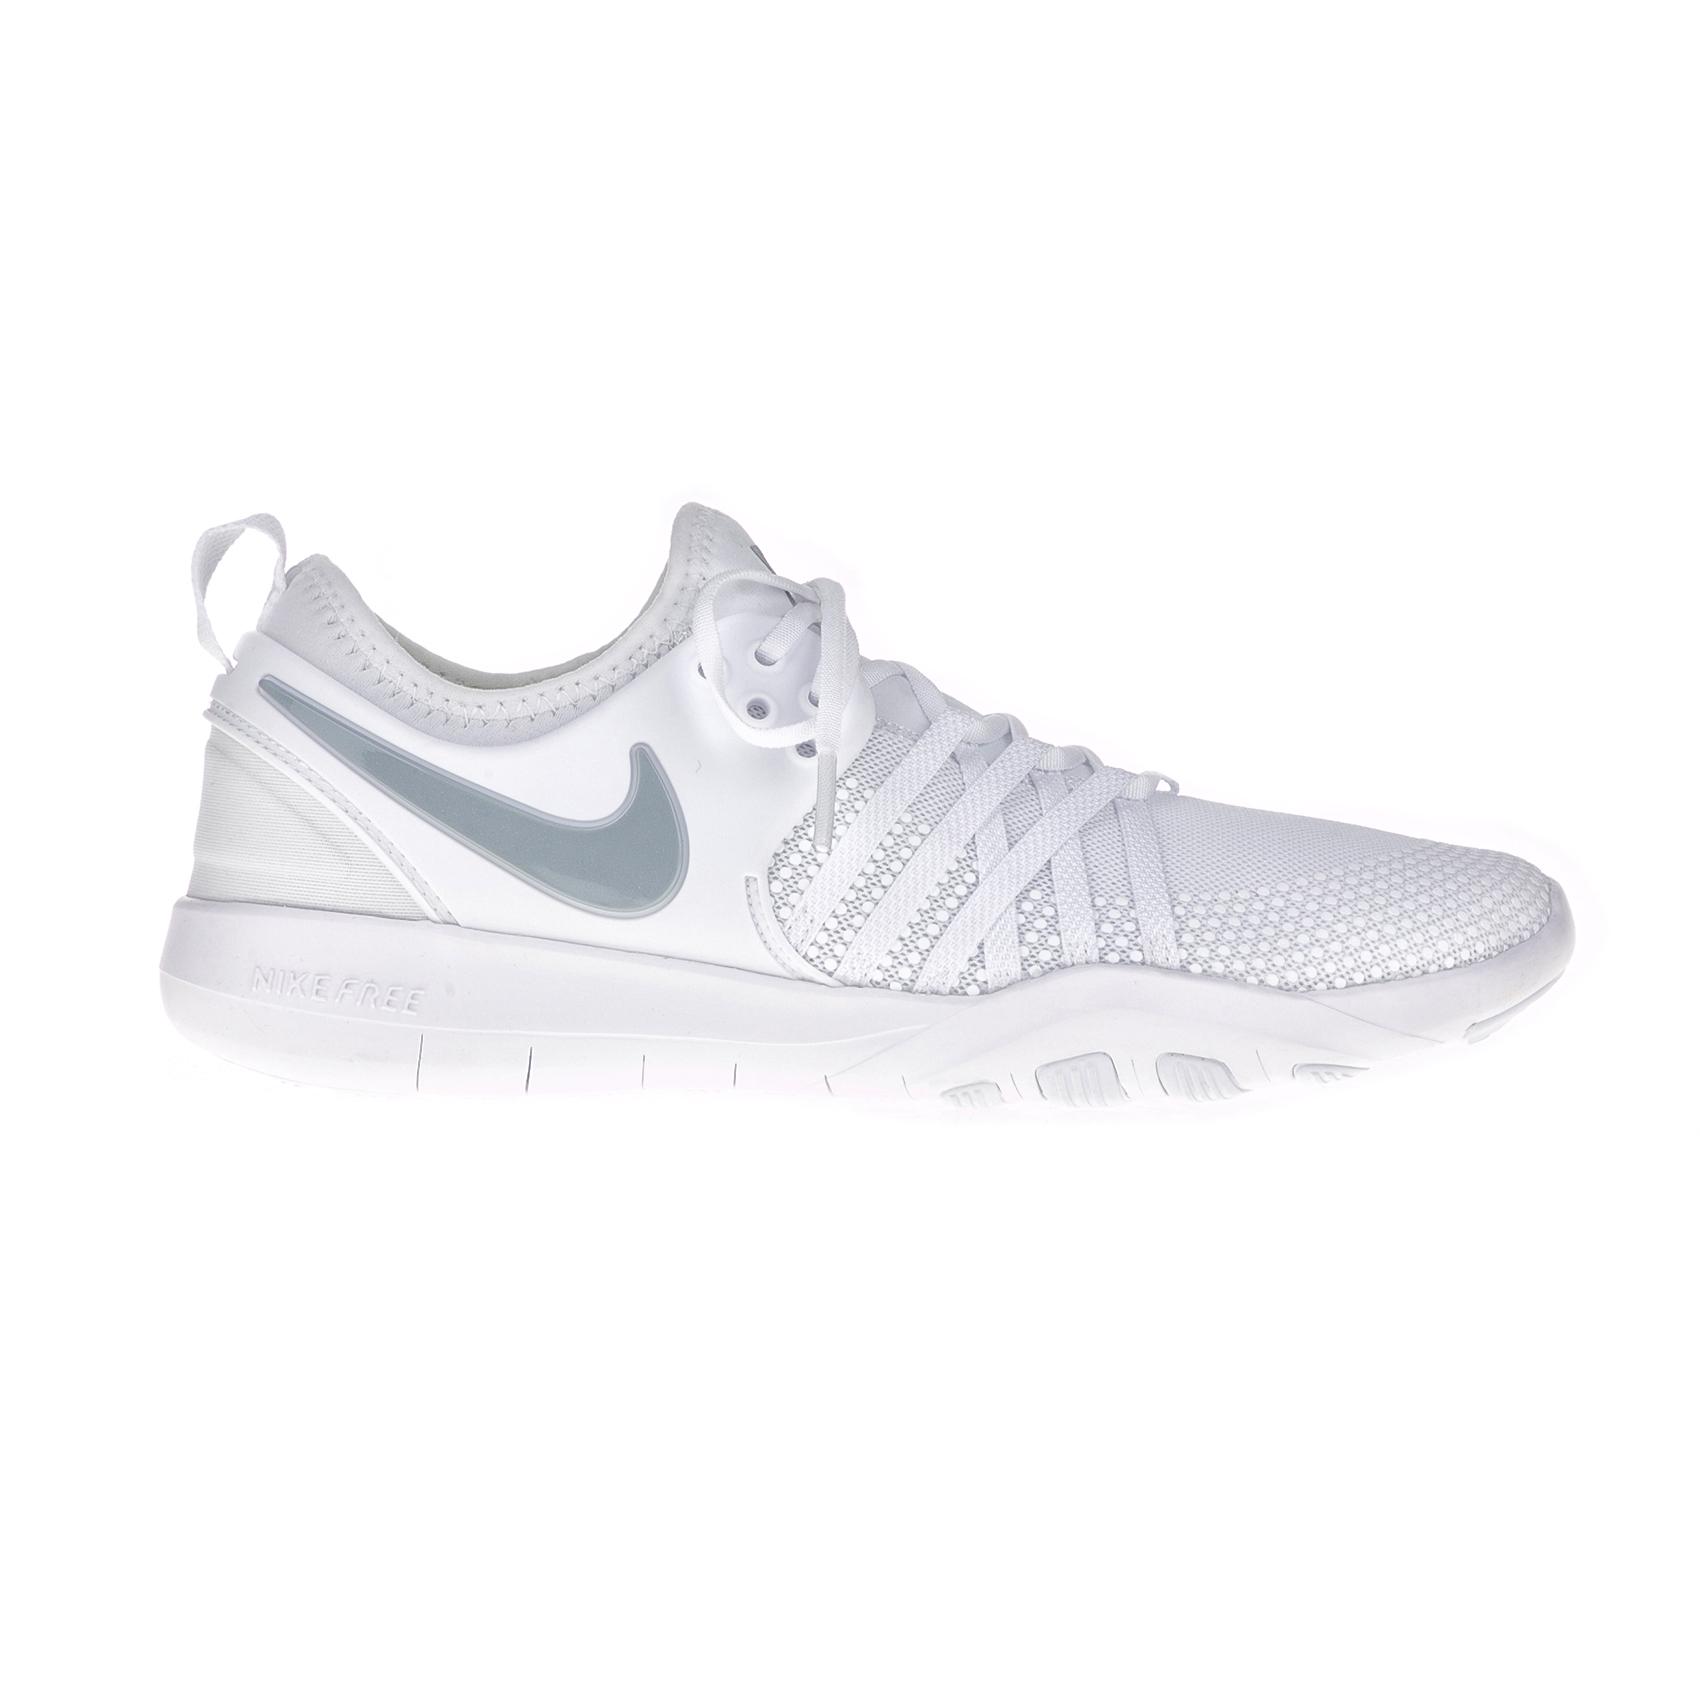 NIKE – Γυναικεία αθλητικά παπούτσια NIKE FREE TR 7 λευκά